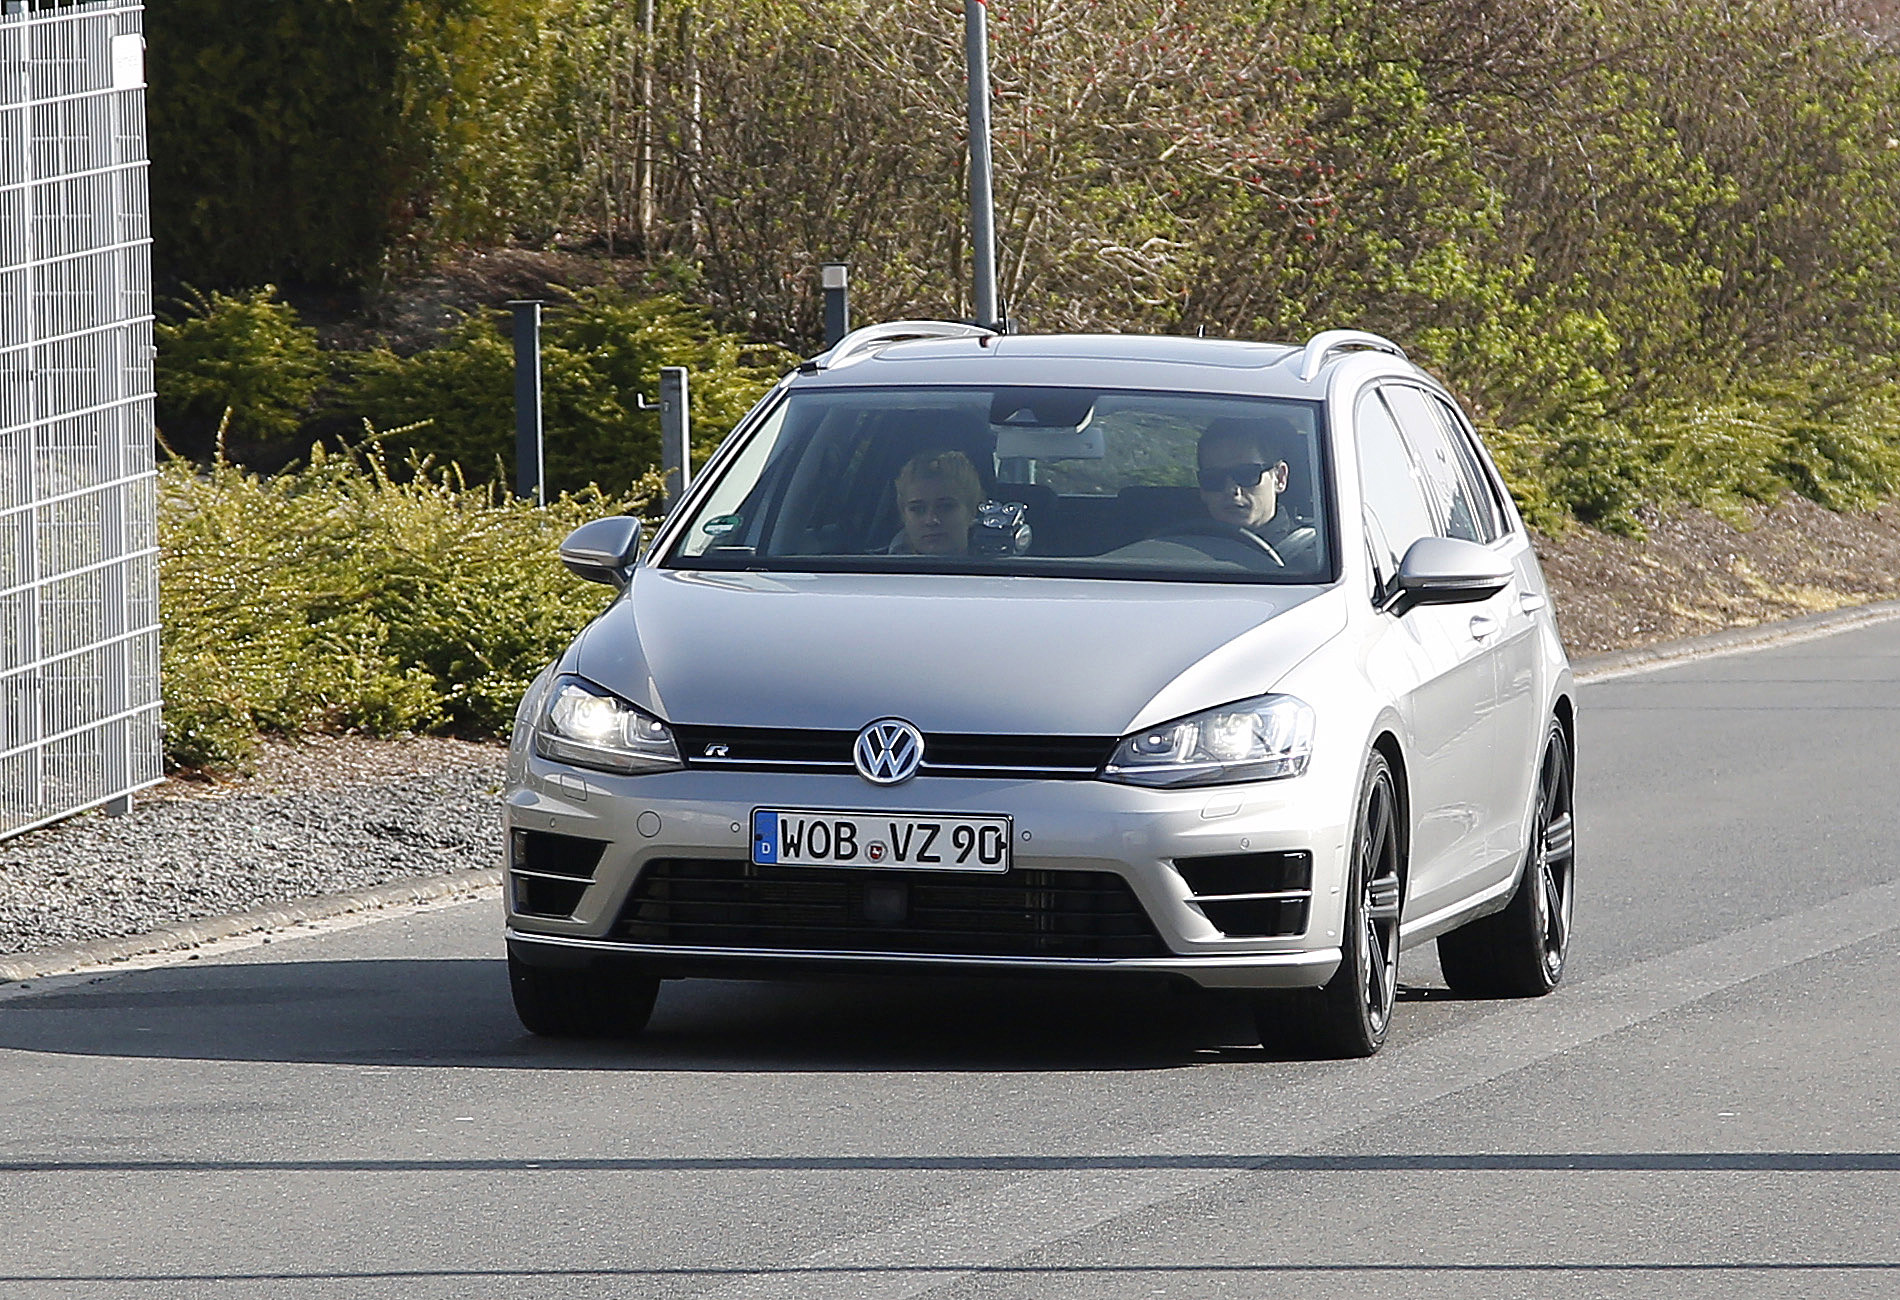 volkswagen-golf-r-variant-wagon-001